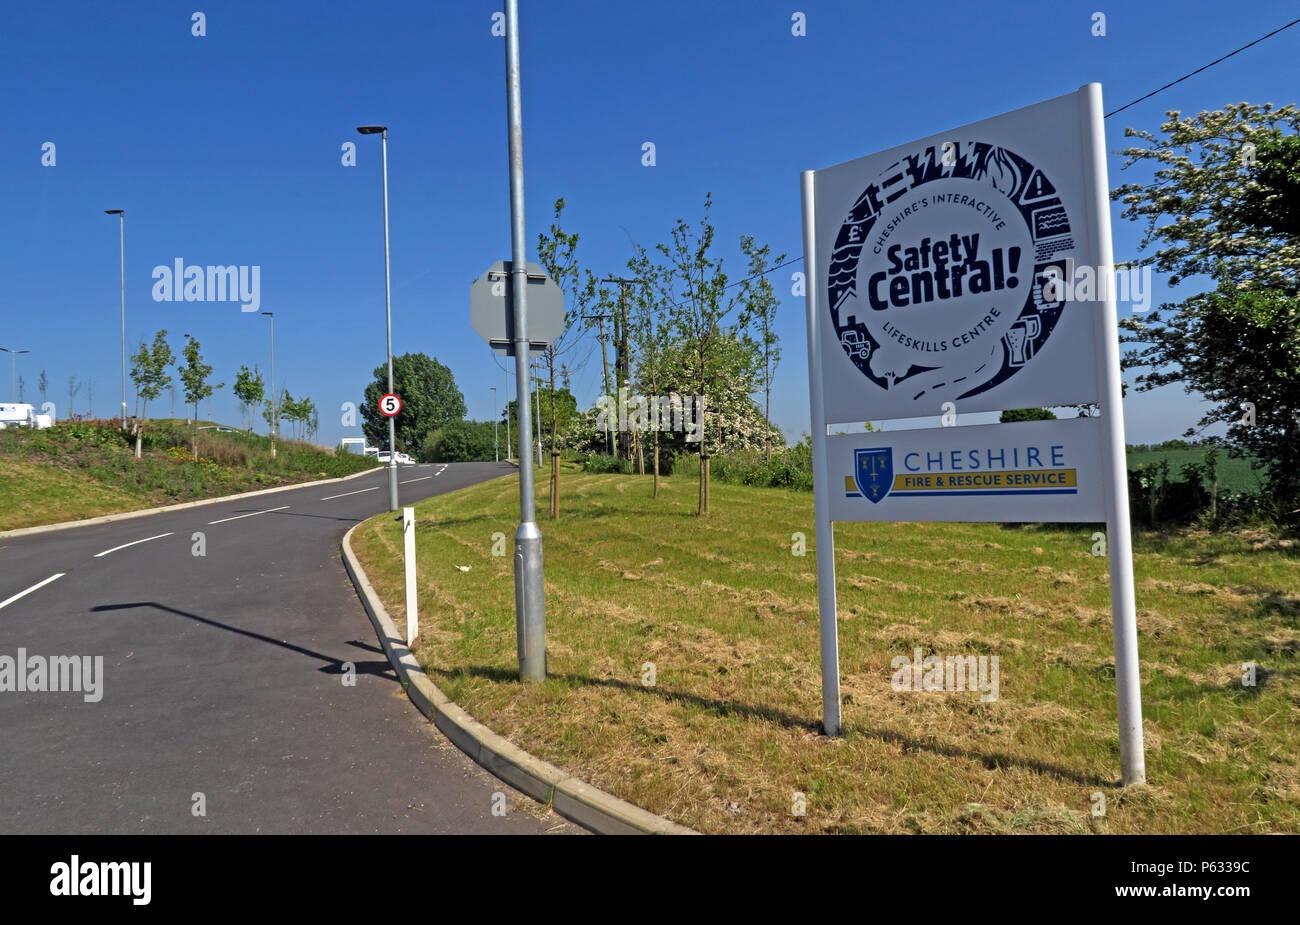 Laden Sie dieses Alamy Stockfoto Warrington, Cheshire Fire & Rescue, Cliff Lane, Lymm, Warrington, Cheshire, North West England, UK, WA13 0TE - P6339C